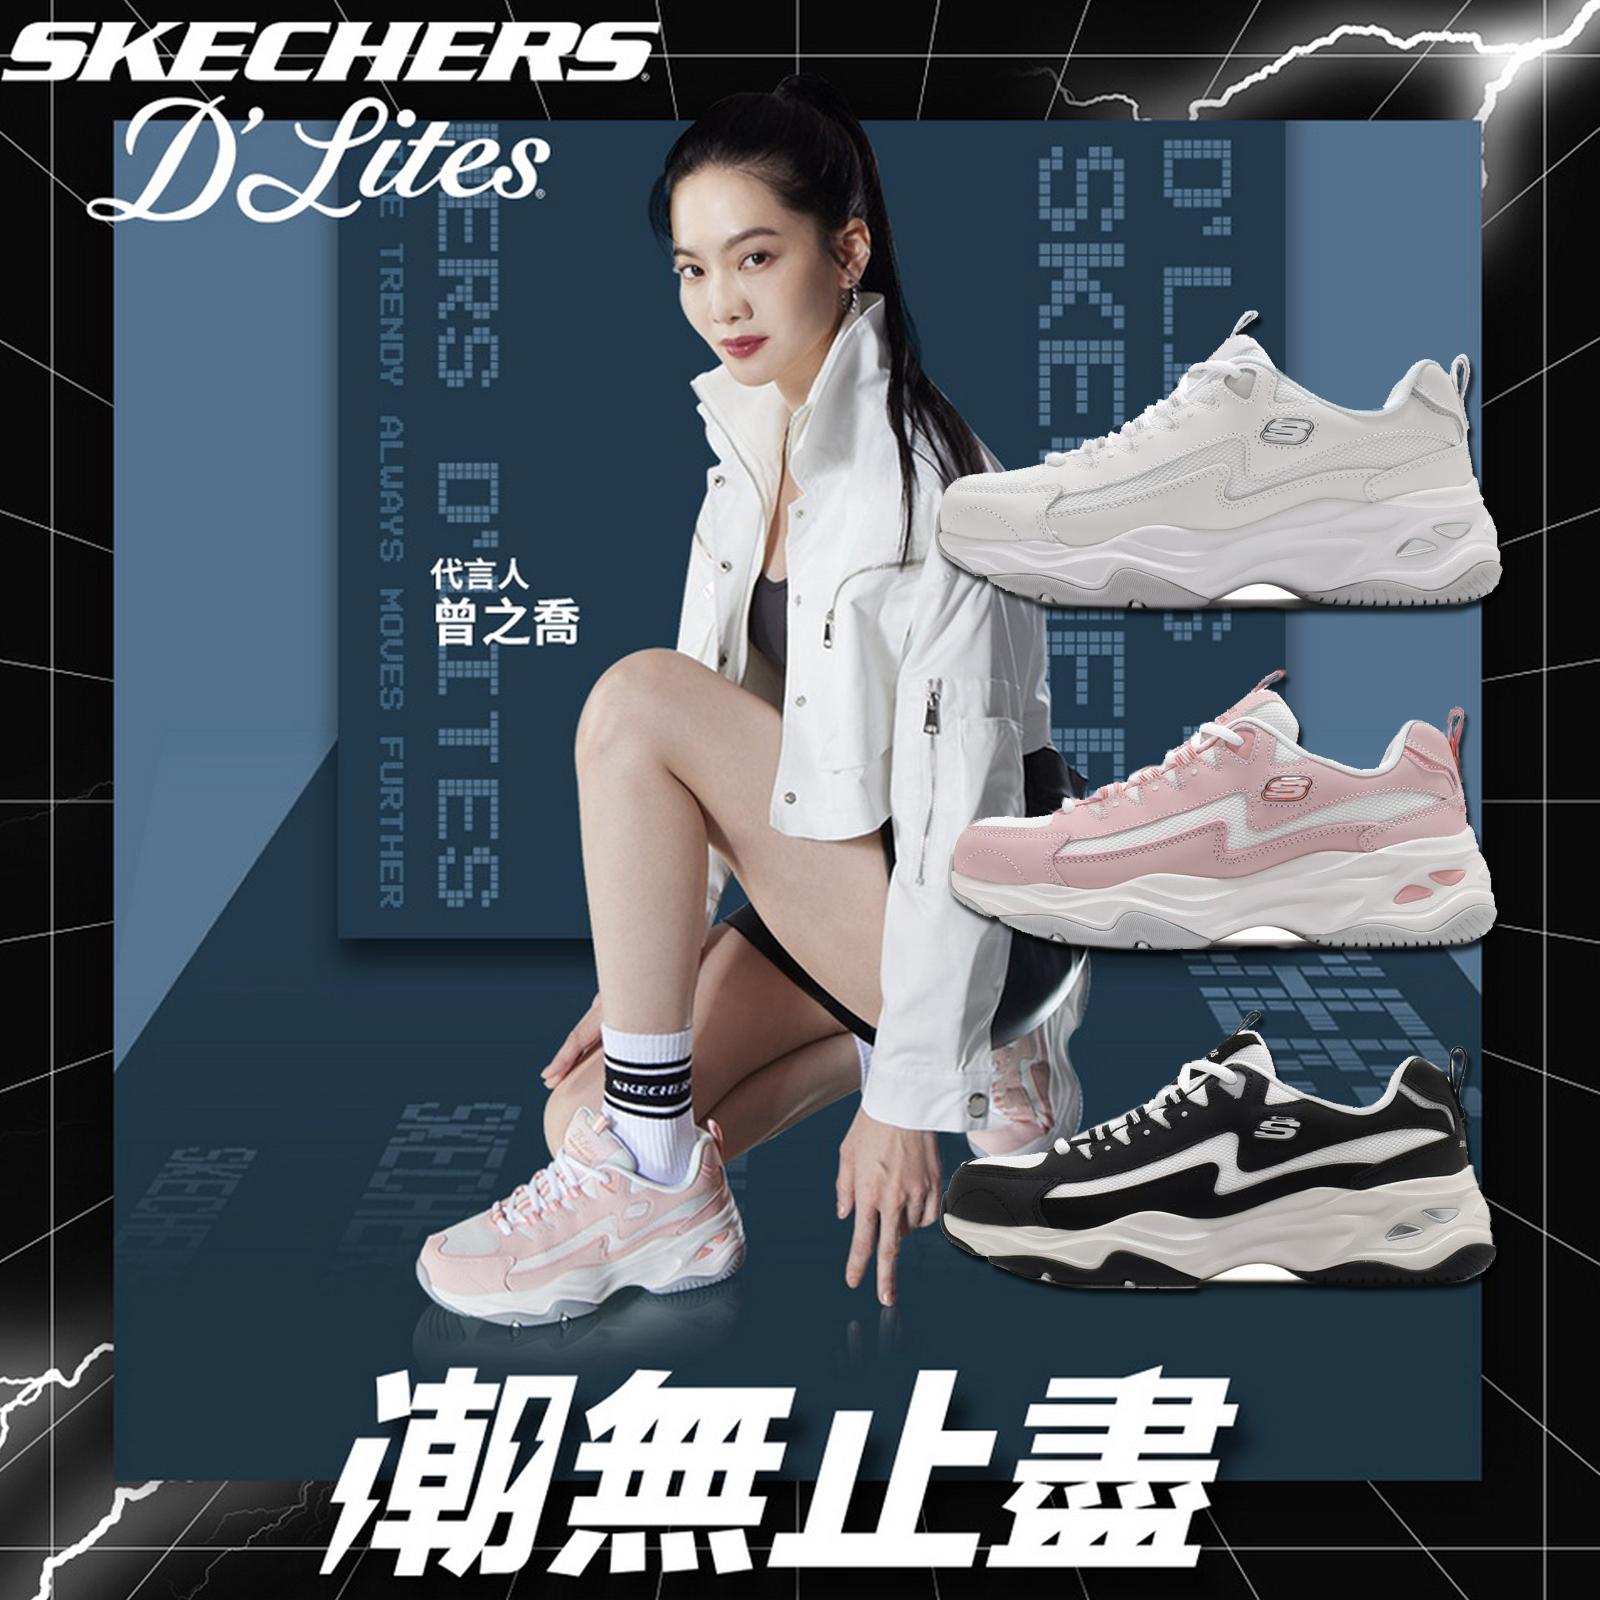 Skechers 老爹鞋 D Lites 4.0 女鞋 主打 曾之喬 厚底 增高 復古休閒鞋 現貨在庫 任選【ACS】